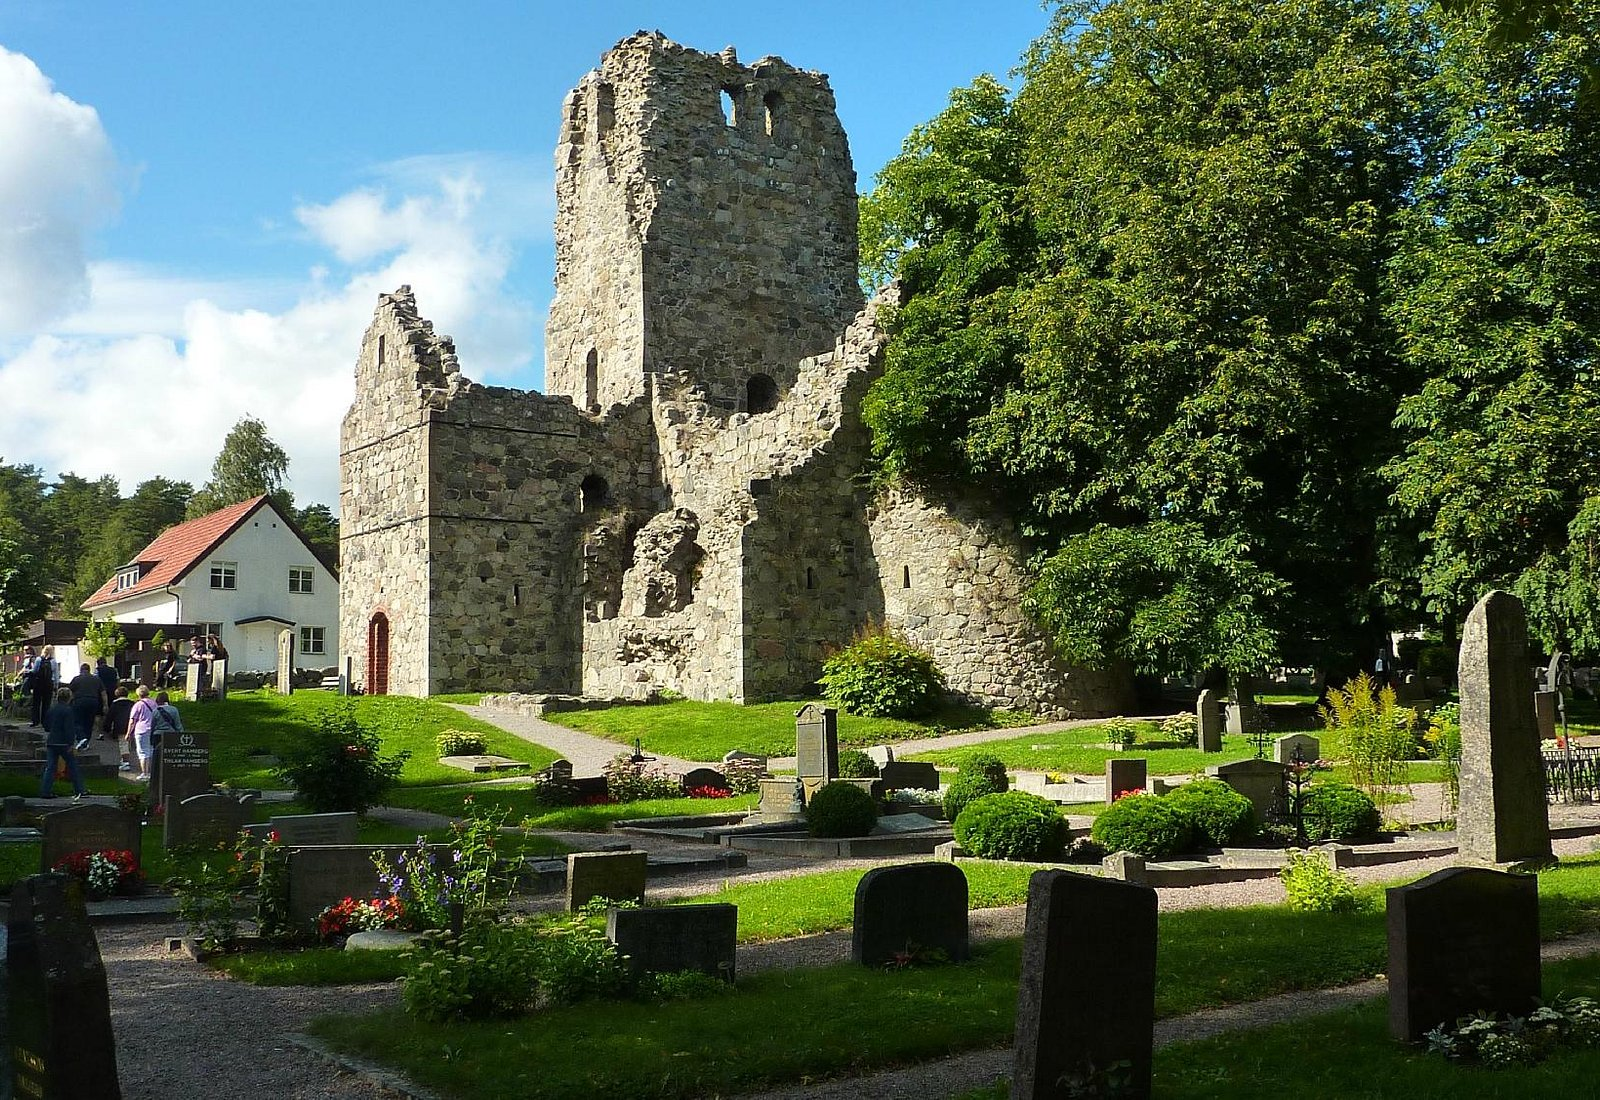 St Olof's Church ruins